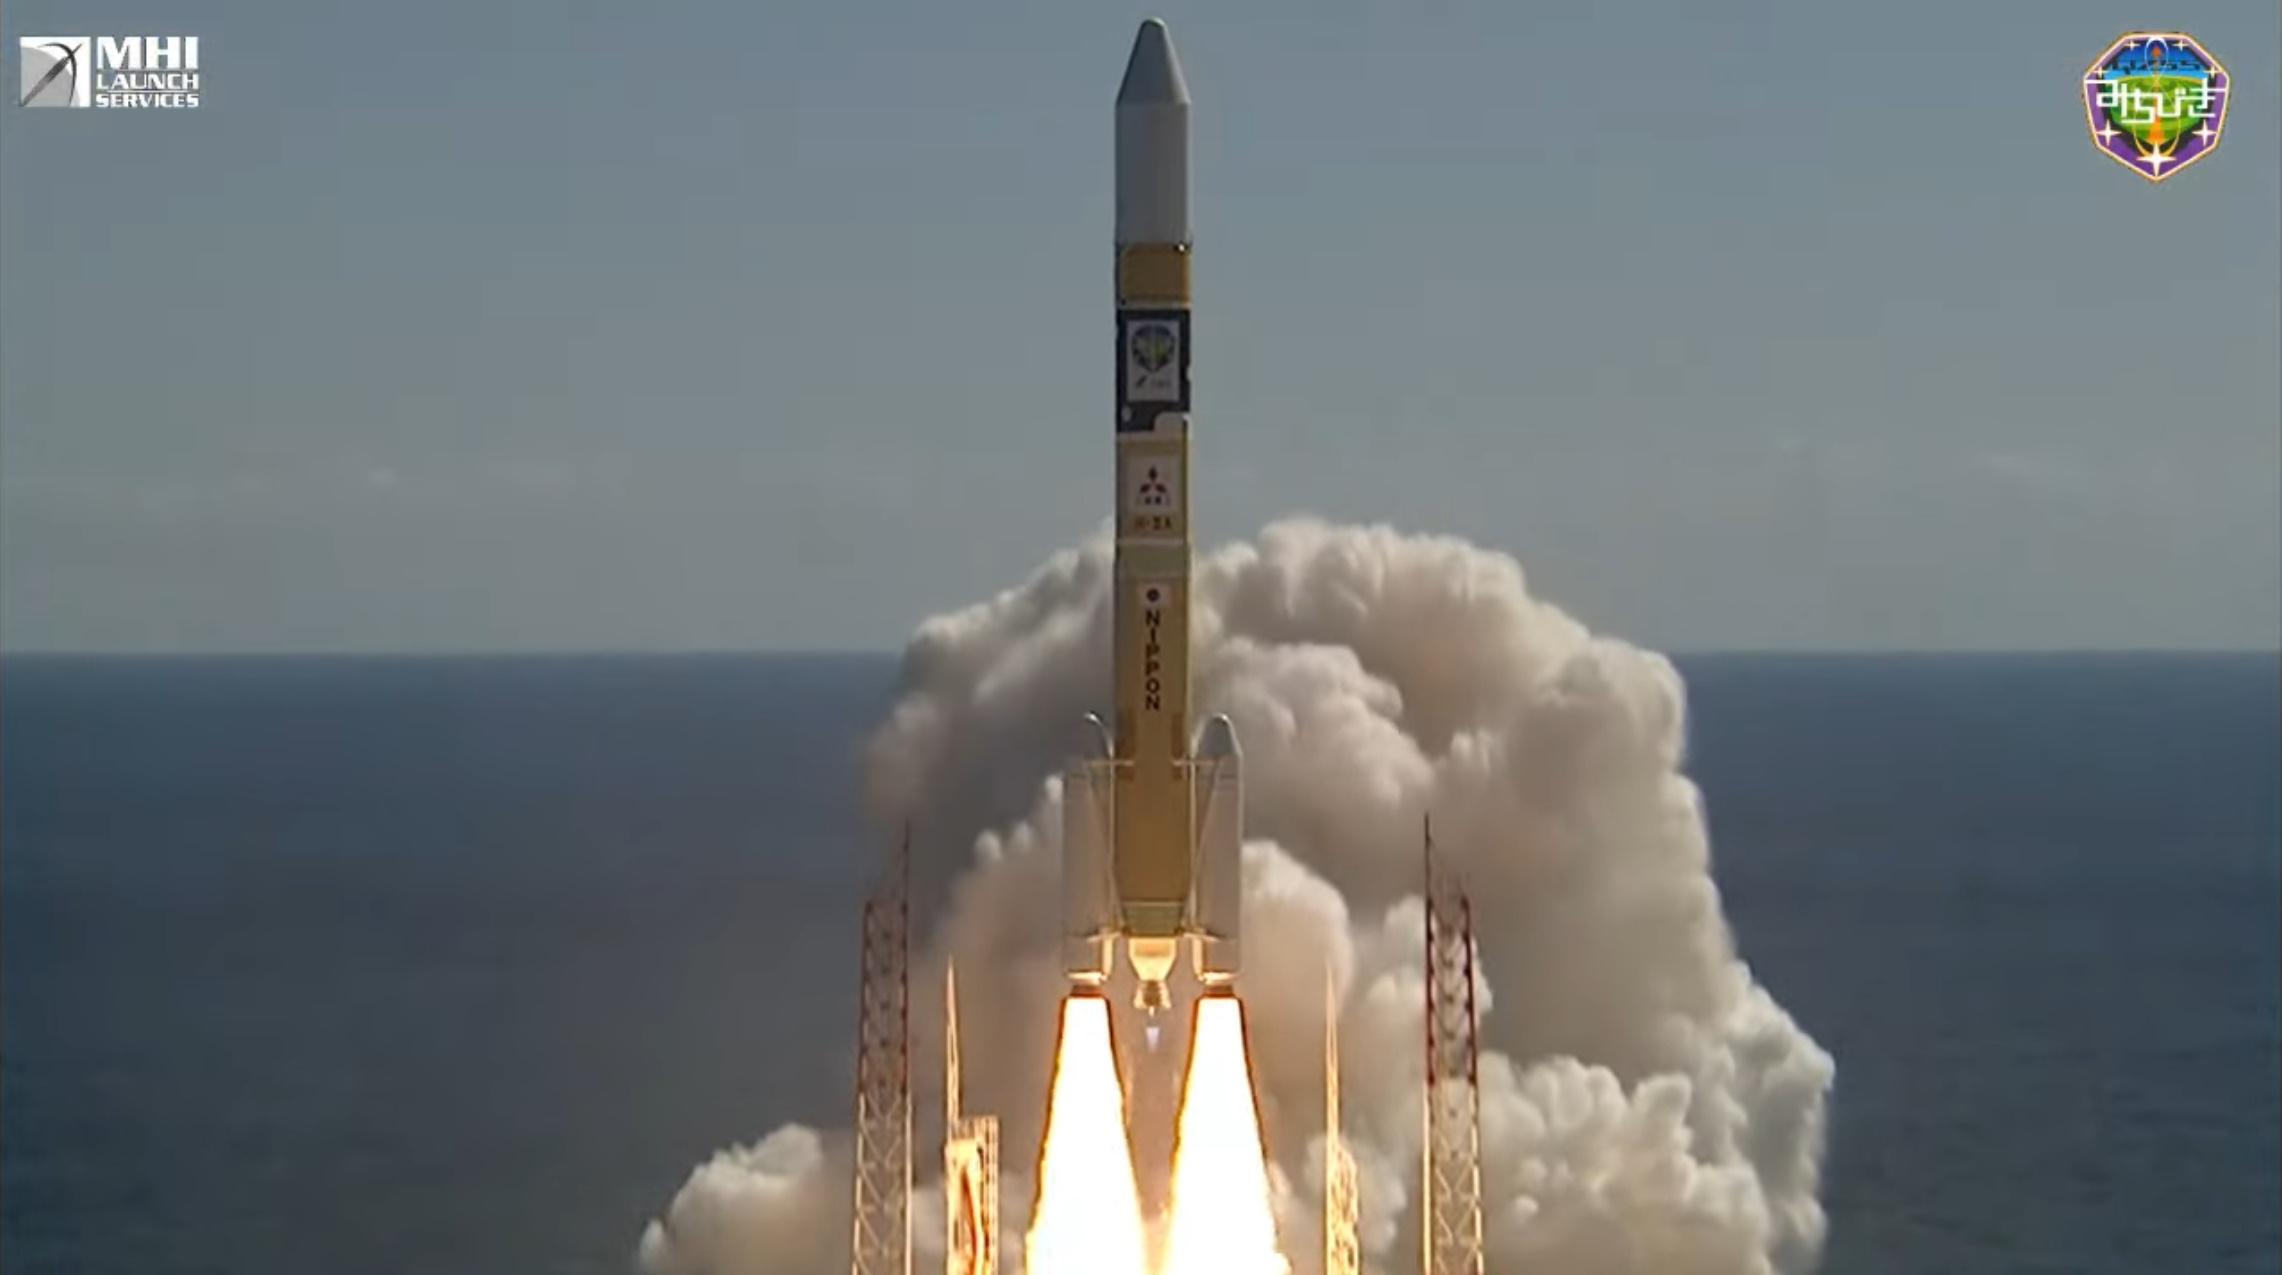 Japan prepared to launch H-IIA with QZS-1R satellite - NASASpaceFlight.com - NASASpaceflight.com